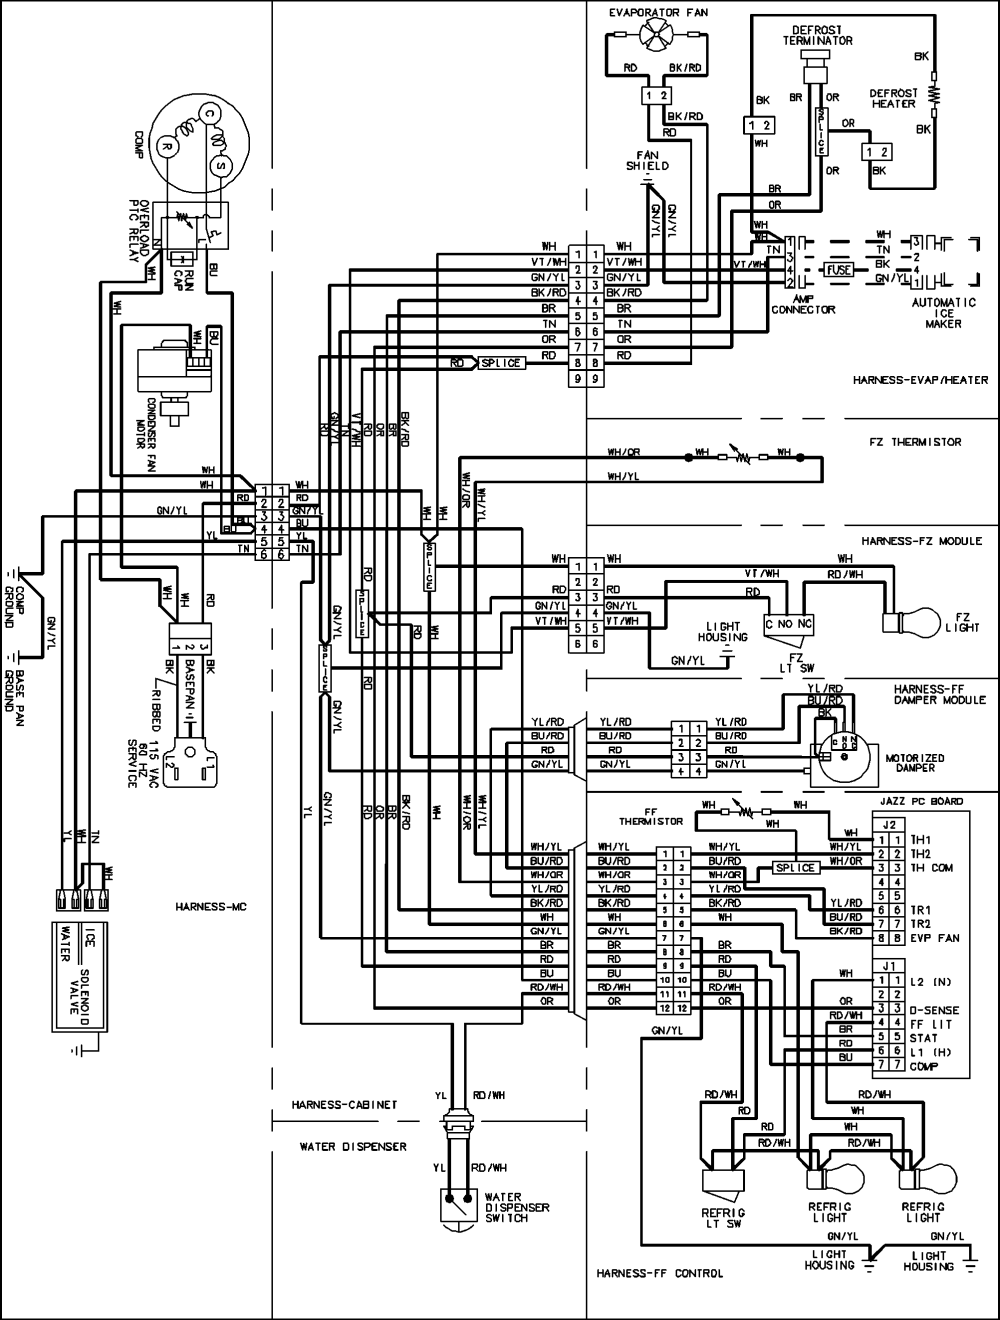 medium resolution of amana refrigerator diagram simple wiring post rh 34 asiagourmet igb de amana refrigerator wiring diagram amana dishwasher schematics